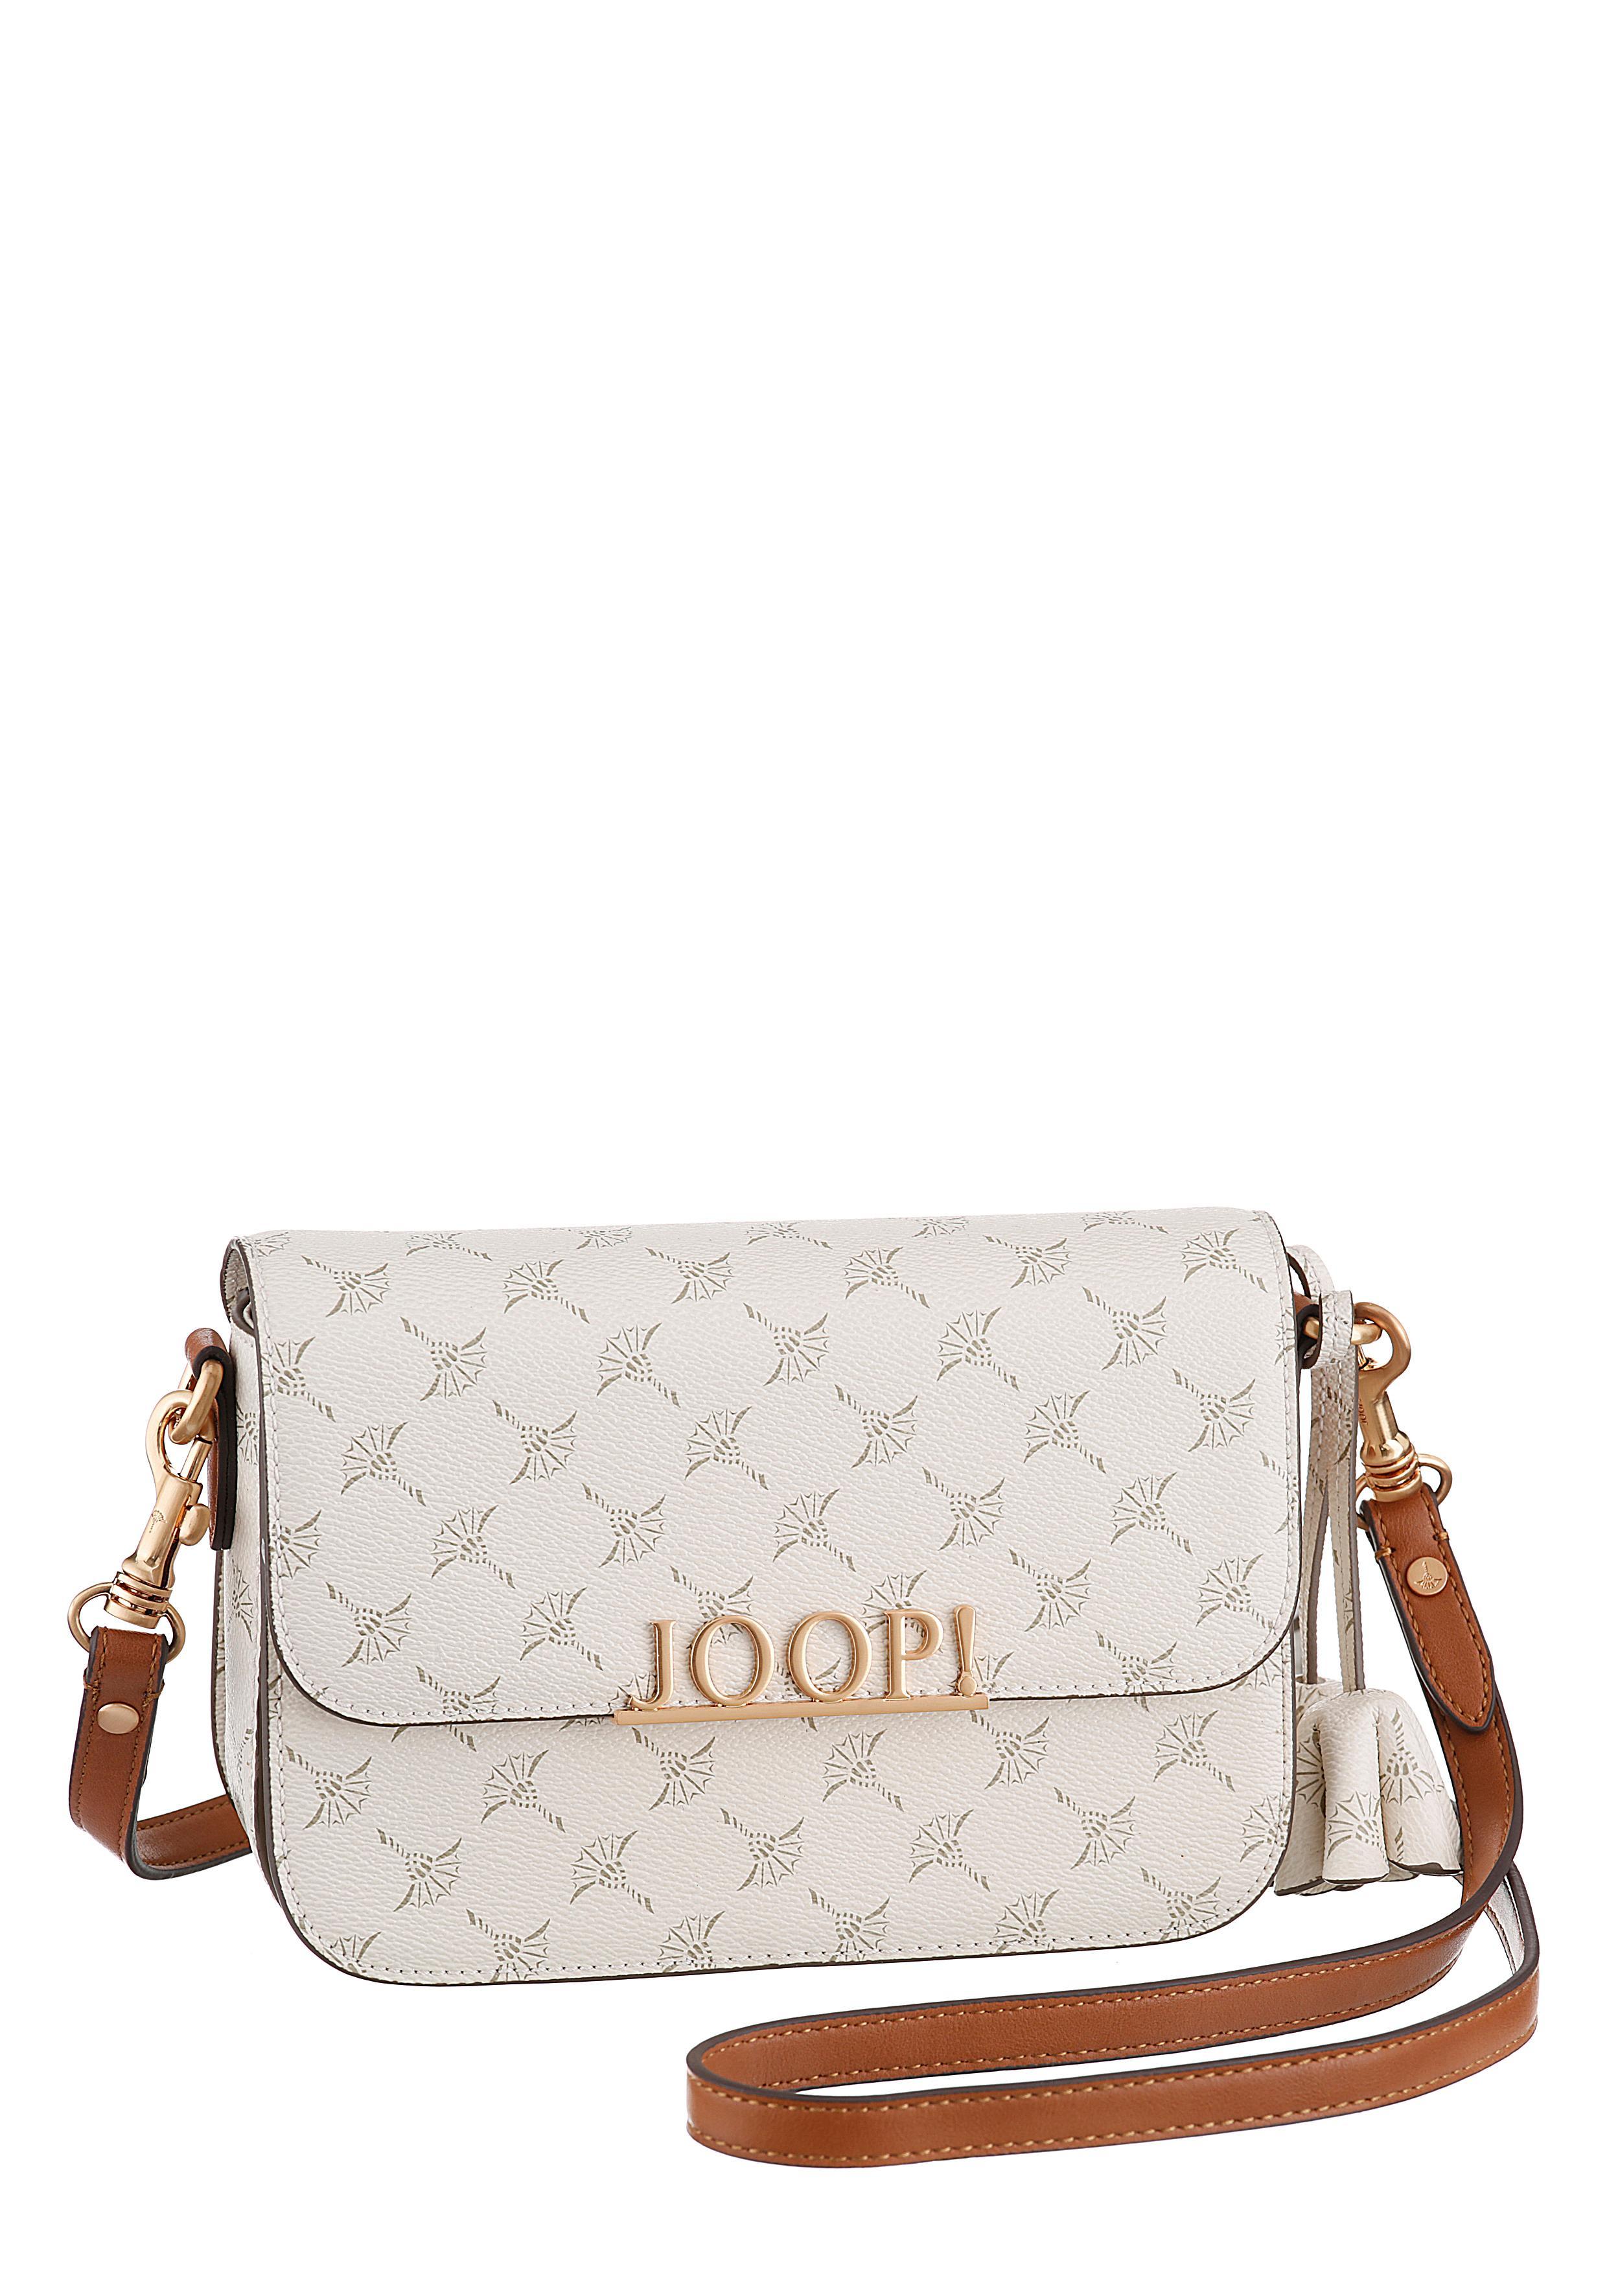 Joop! Mini Bag cortina uma shoulderbag xshf | Taschen > Handtaschen > Abendtaschen | Weiß | Joop!